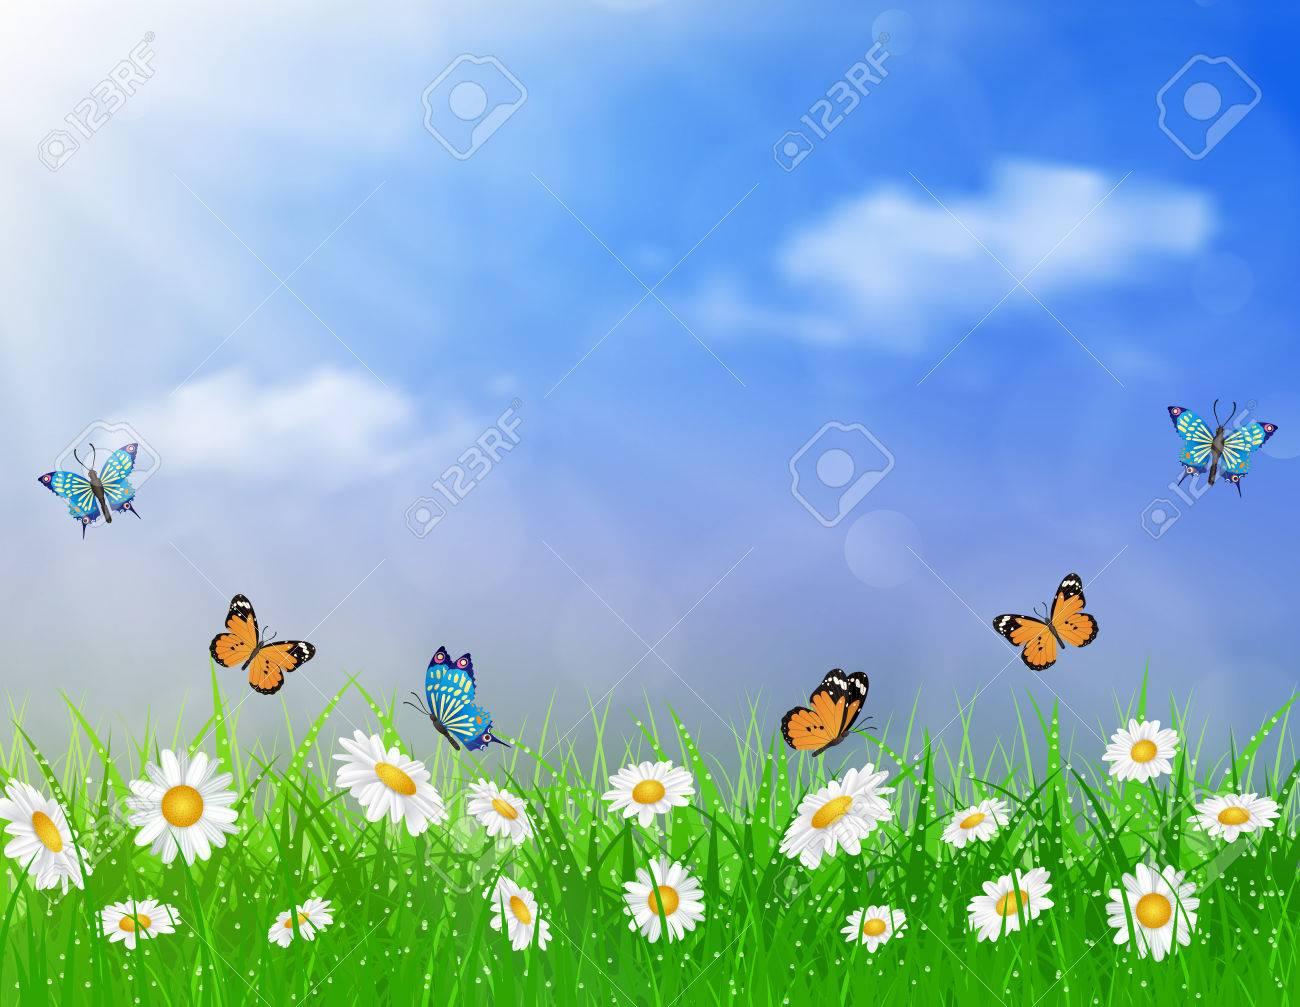 Daisy Vector Background Summer Design Flower Green Garden Nature Illustration Spring Of Blue Sky